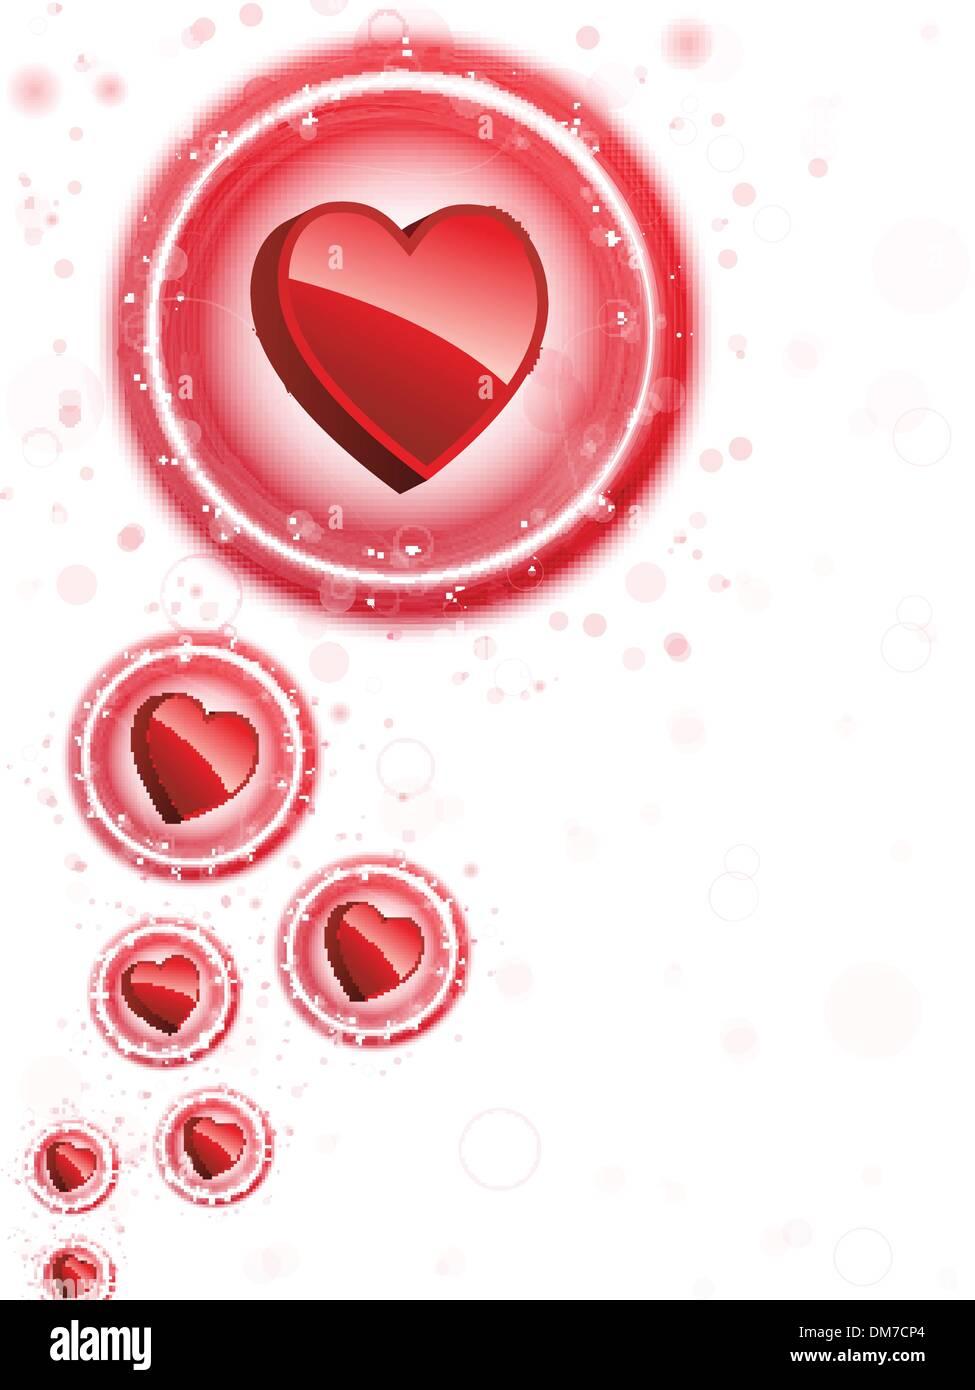 Heart Shaped Wedding Bubbles